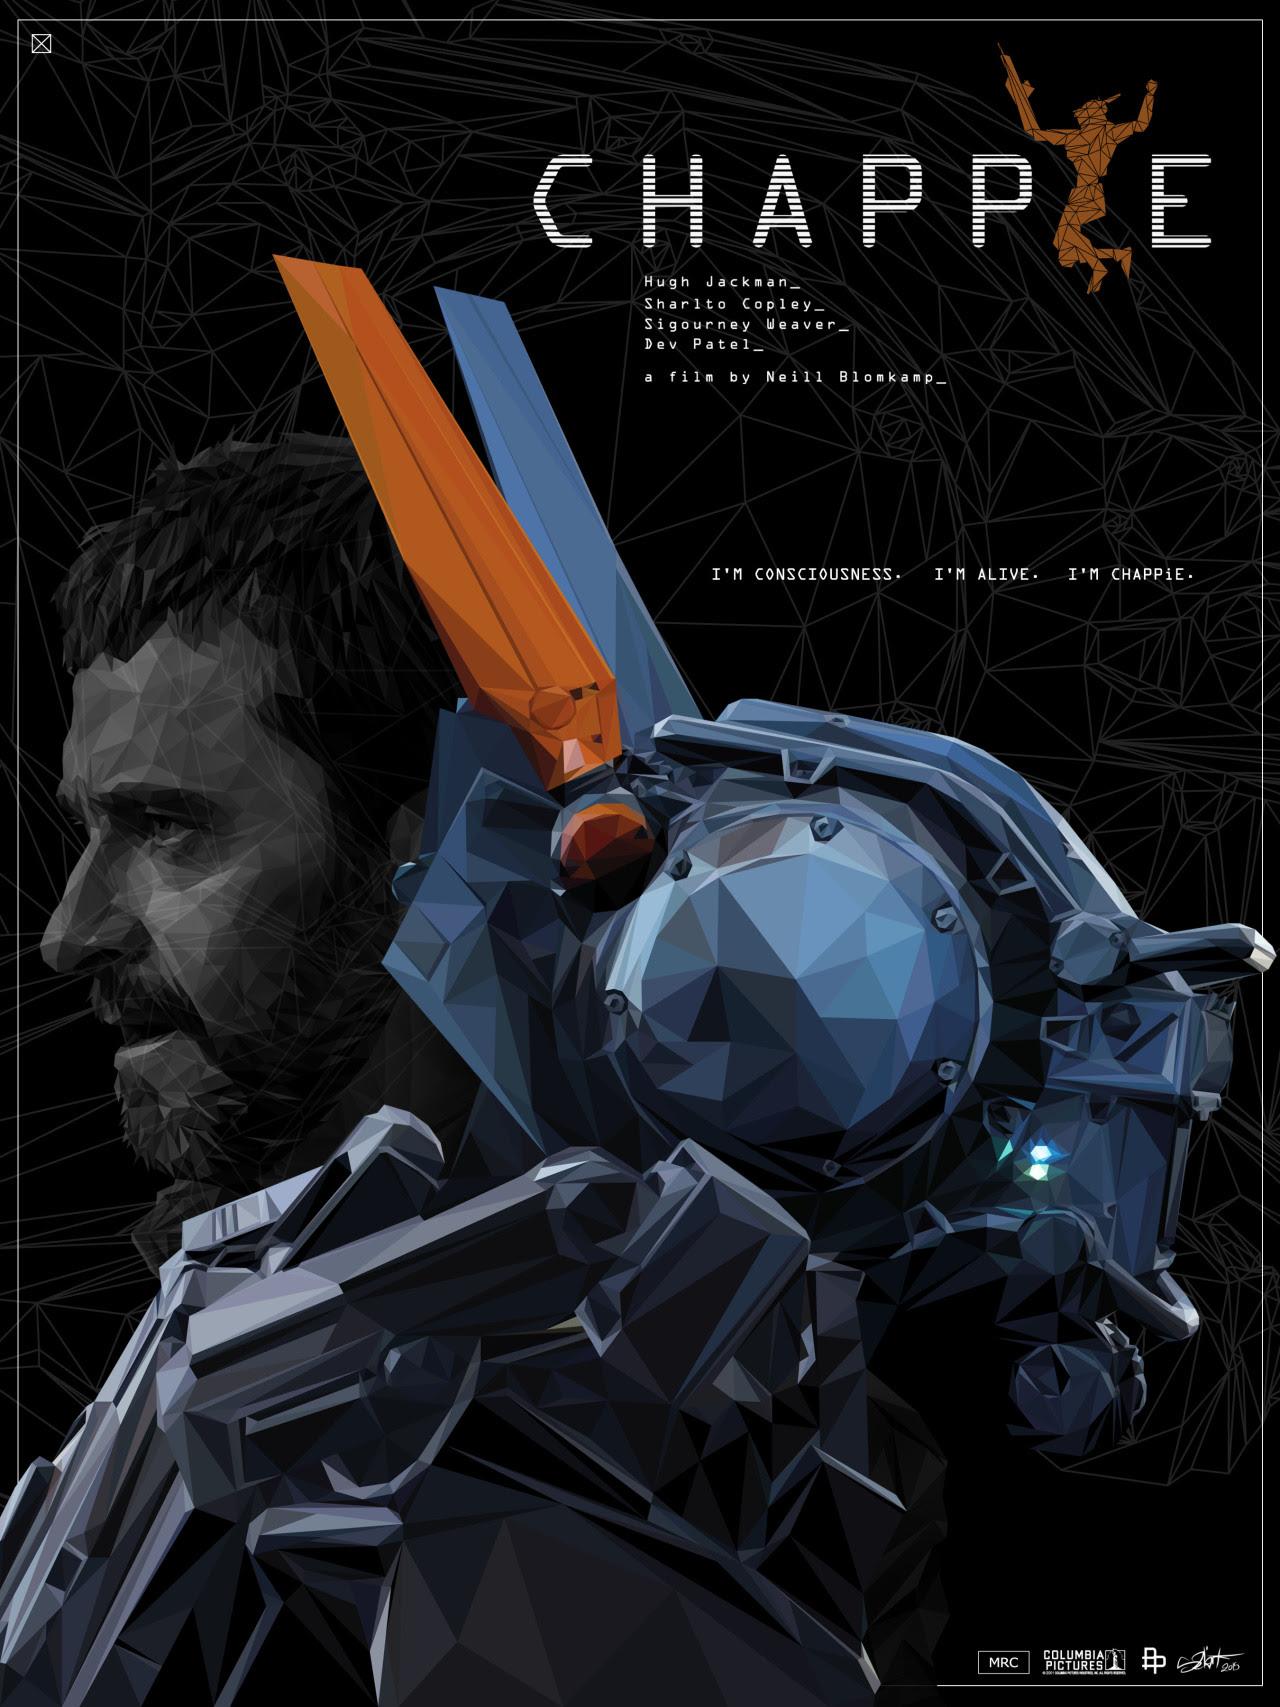 fan poster for Chappie